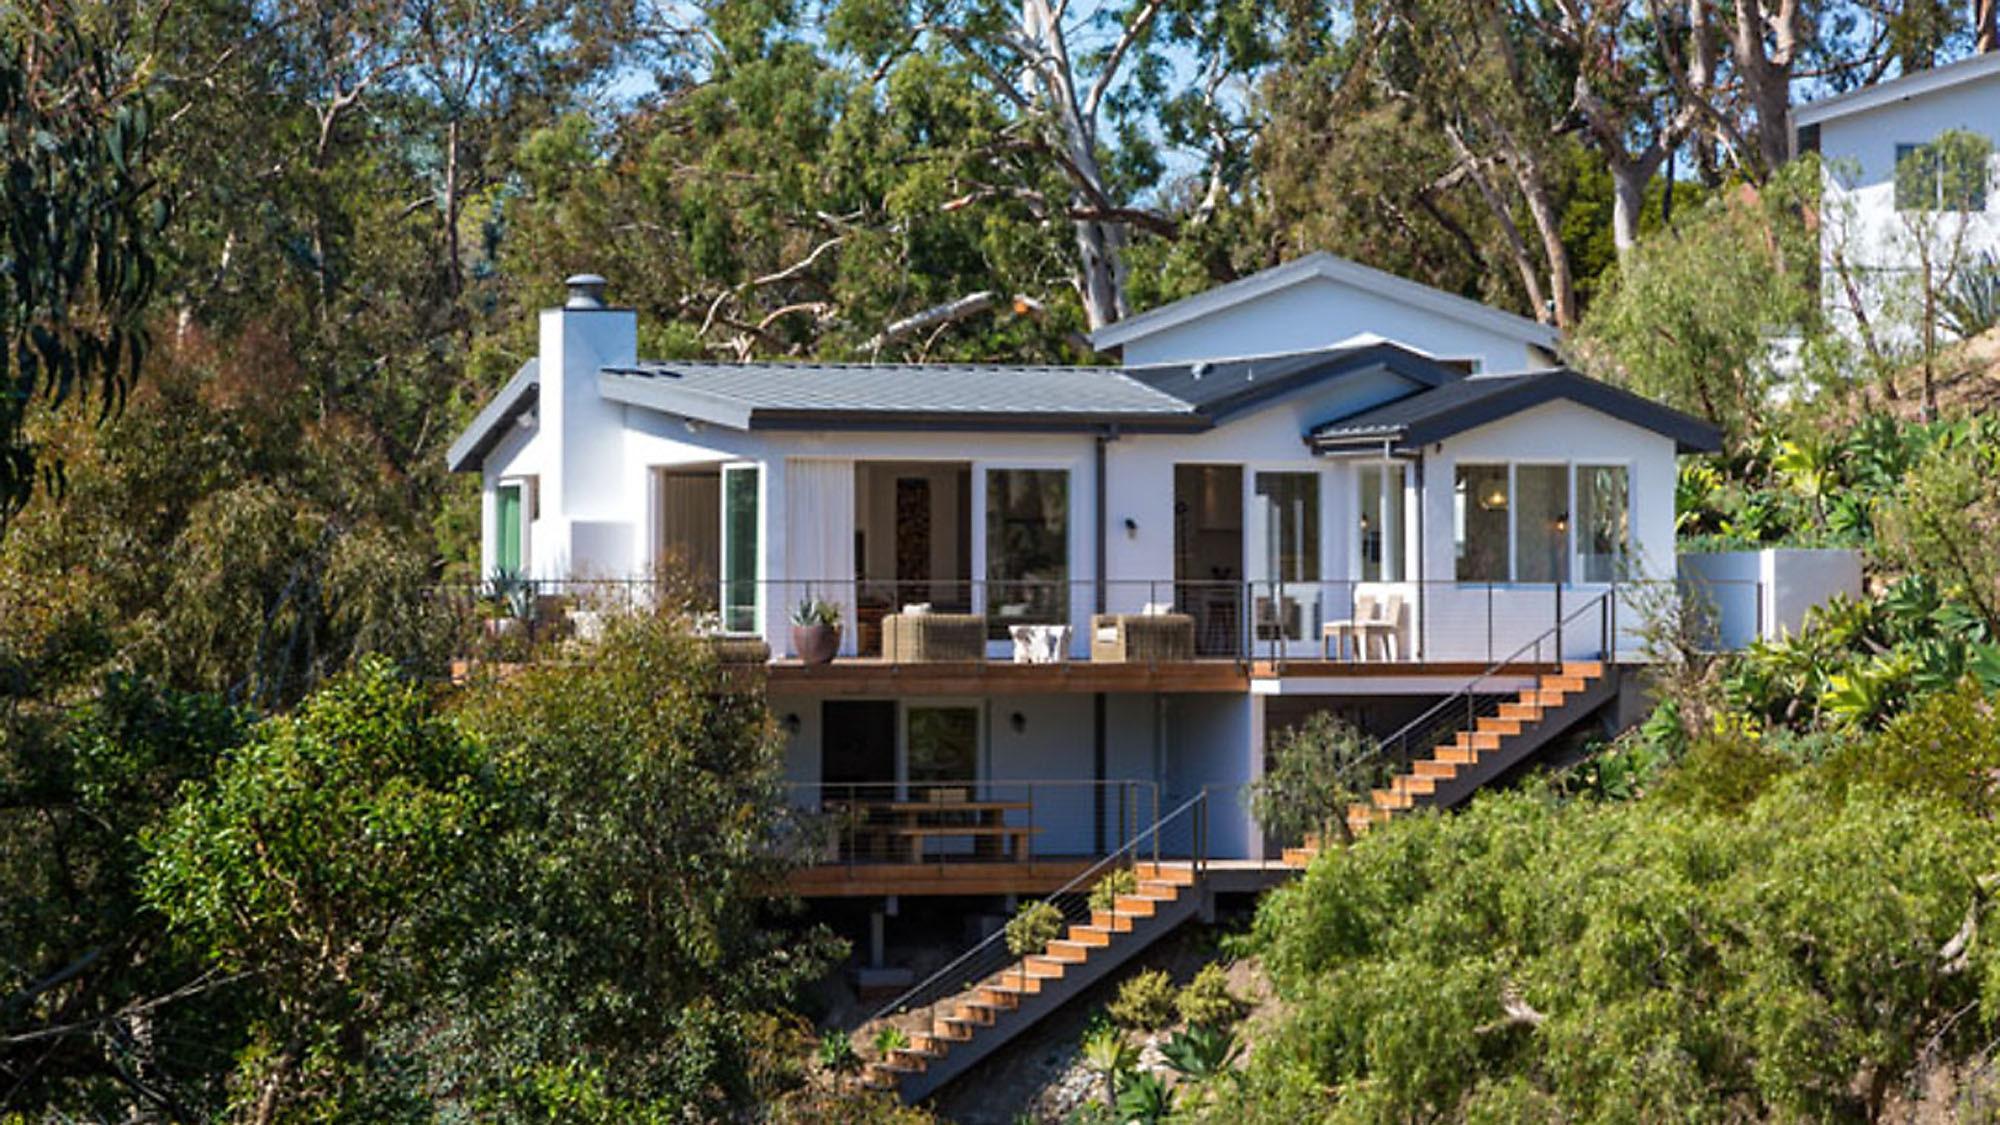 Cindy Crawford Home Supermodel Cindy Crawford Gets Top Dollar For Malibu House La Times